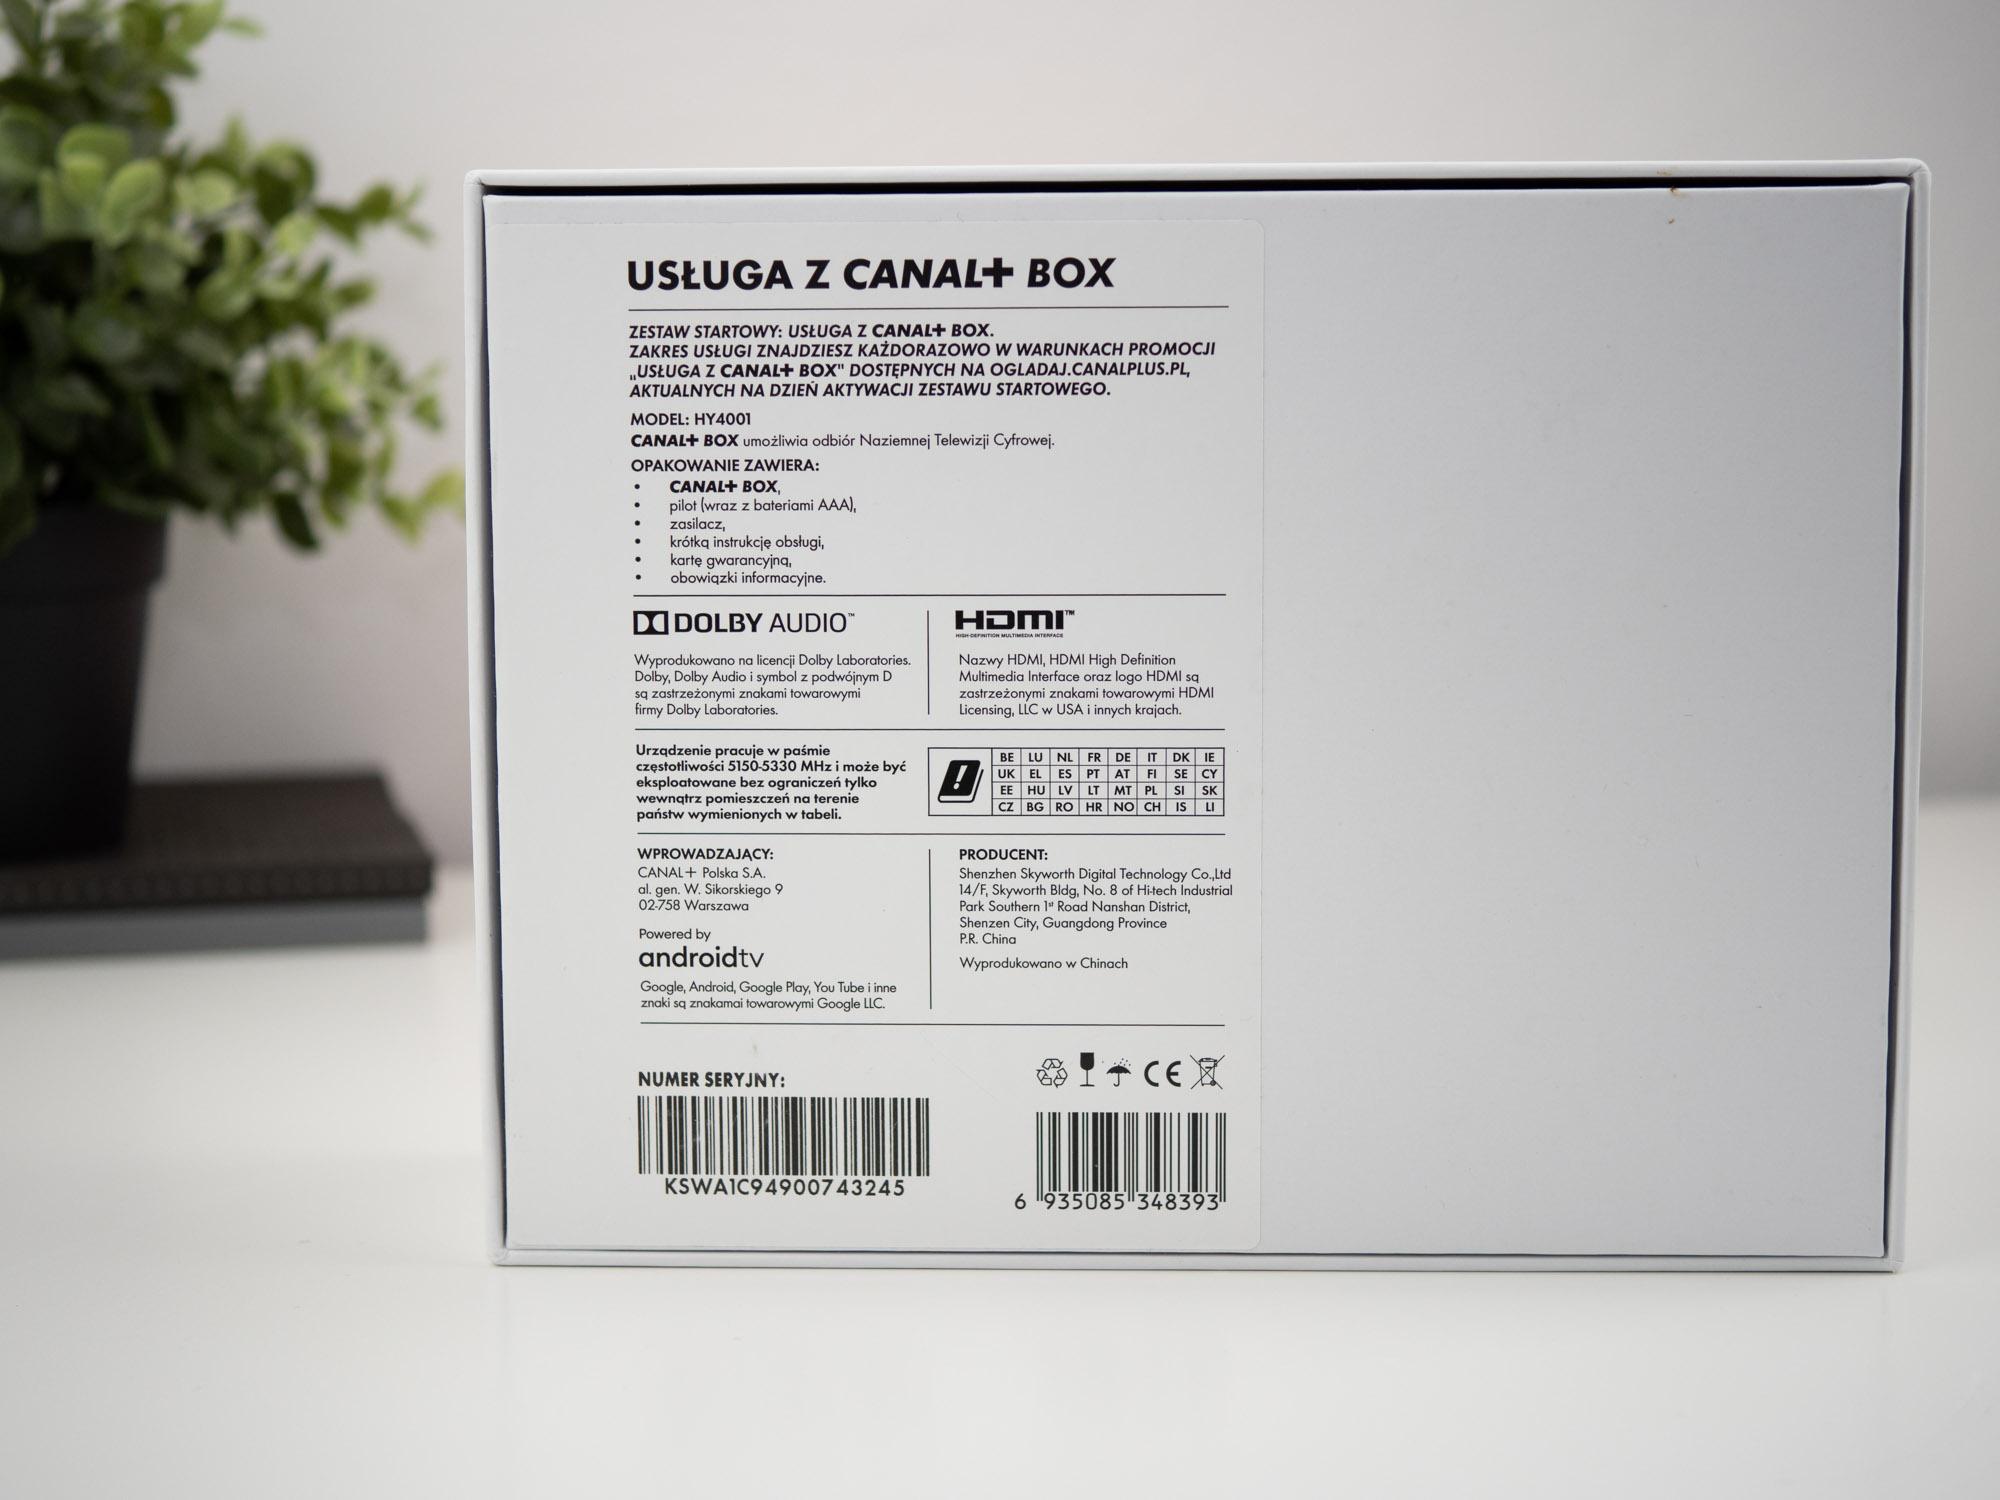 CANAL+ BOX